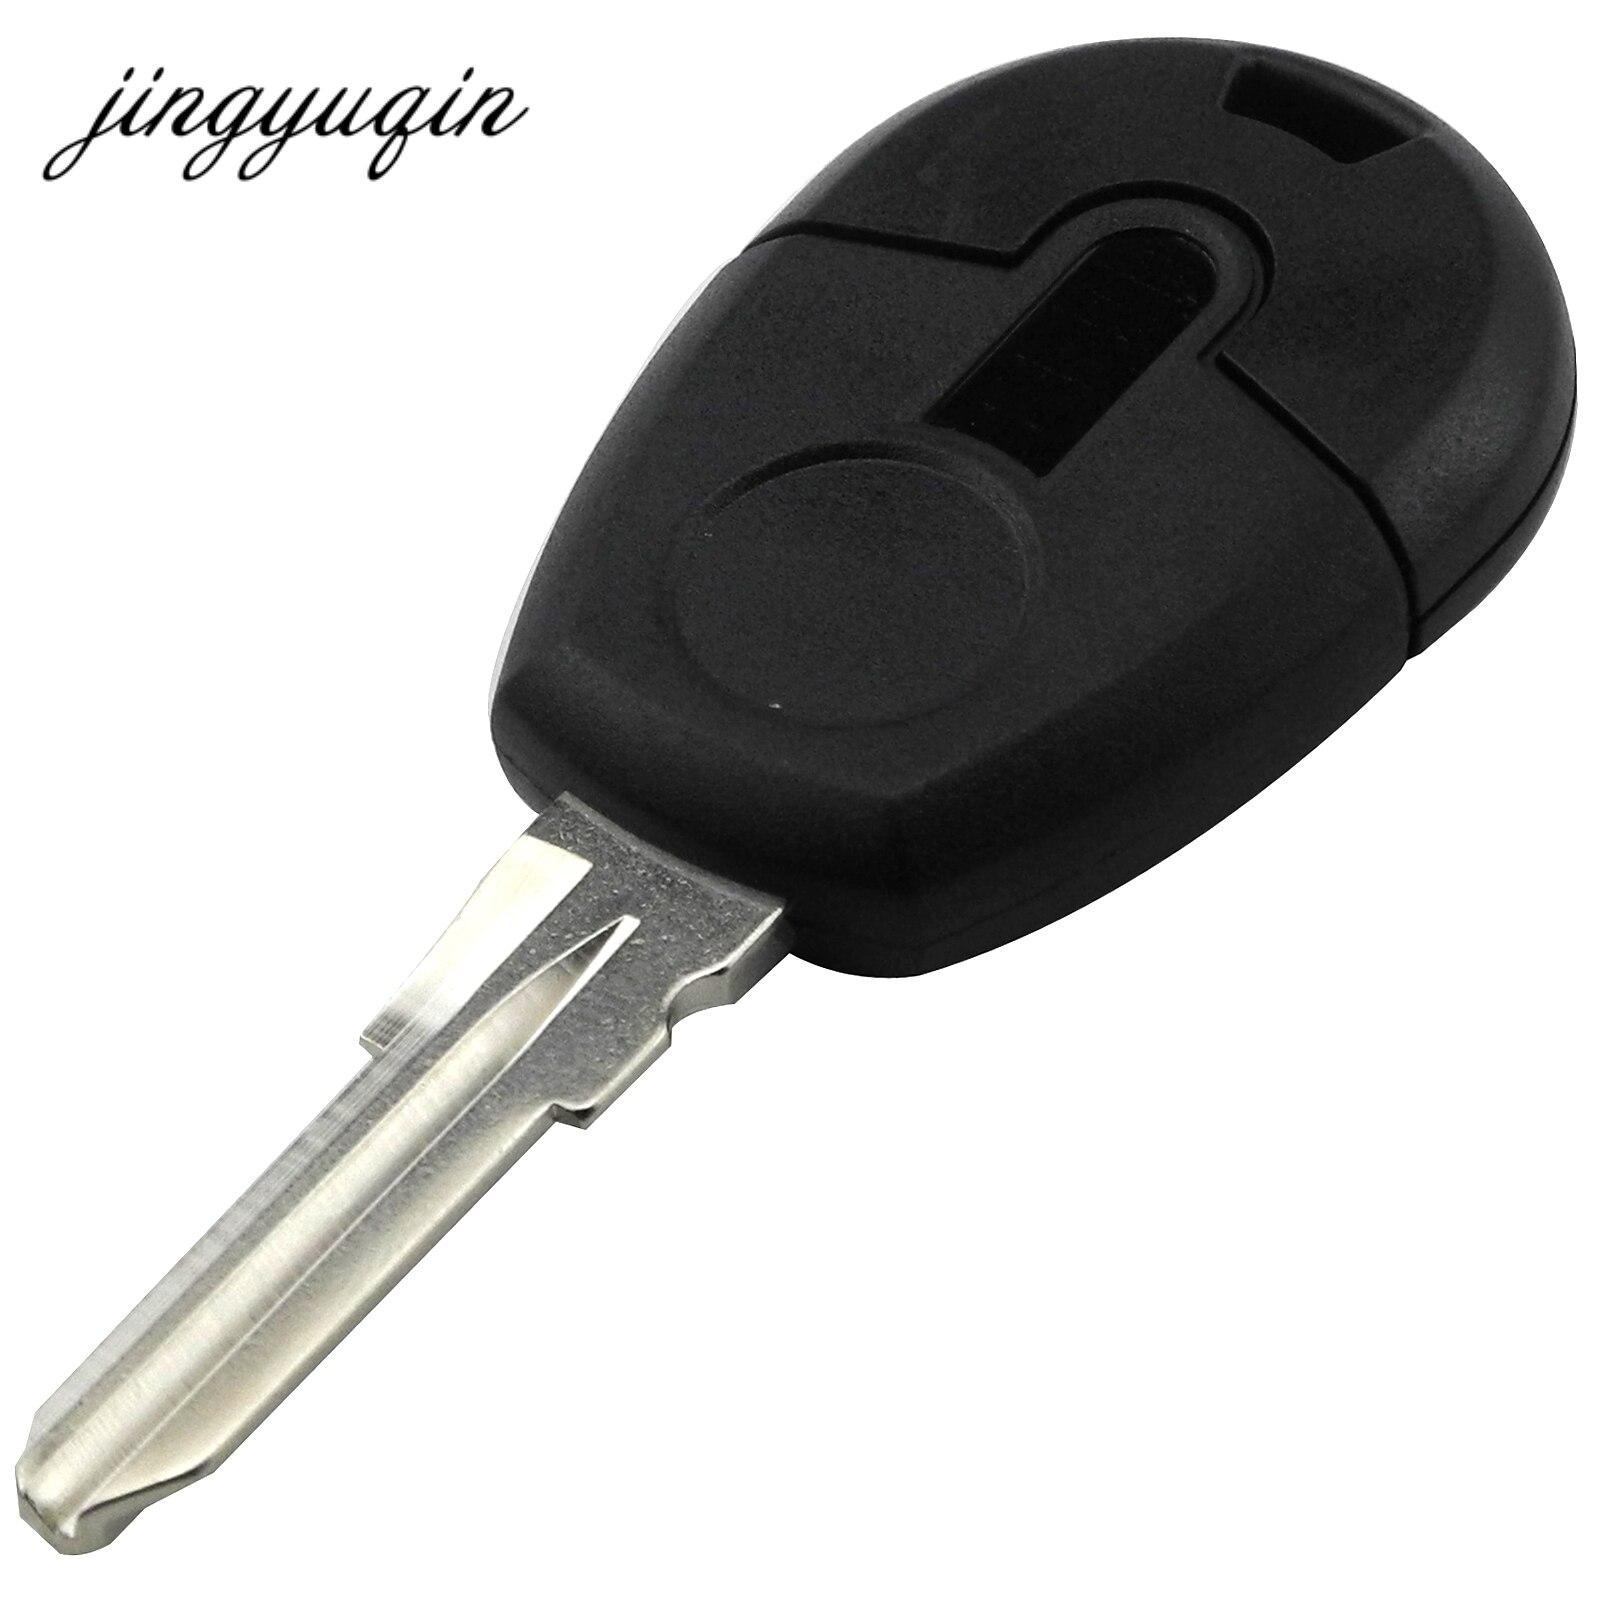 jingyuqin 15pcs lot New style Replacement Car Key Blank Case For Fiat Positron EX300 Transponder Key